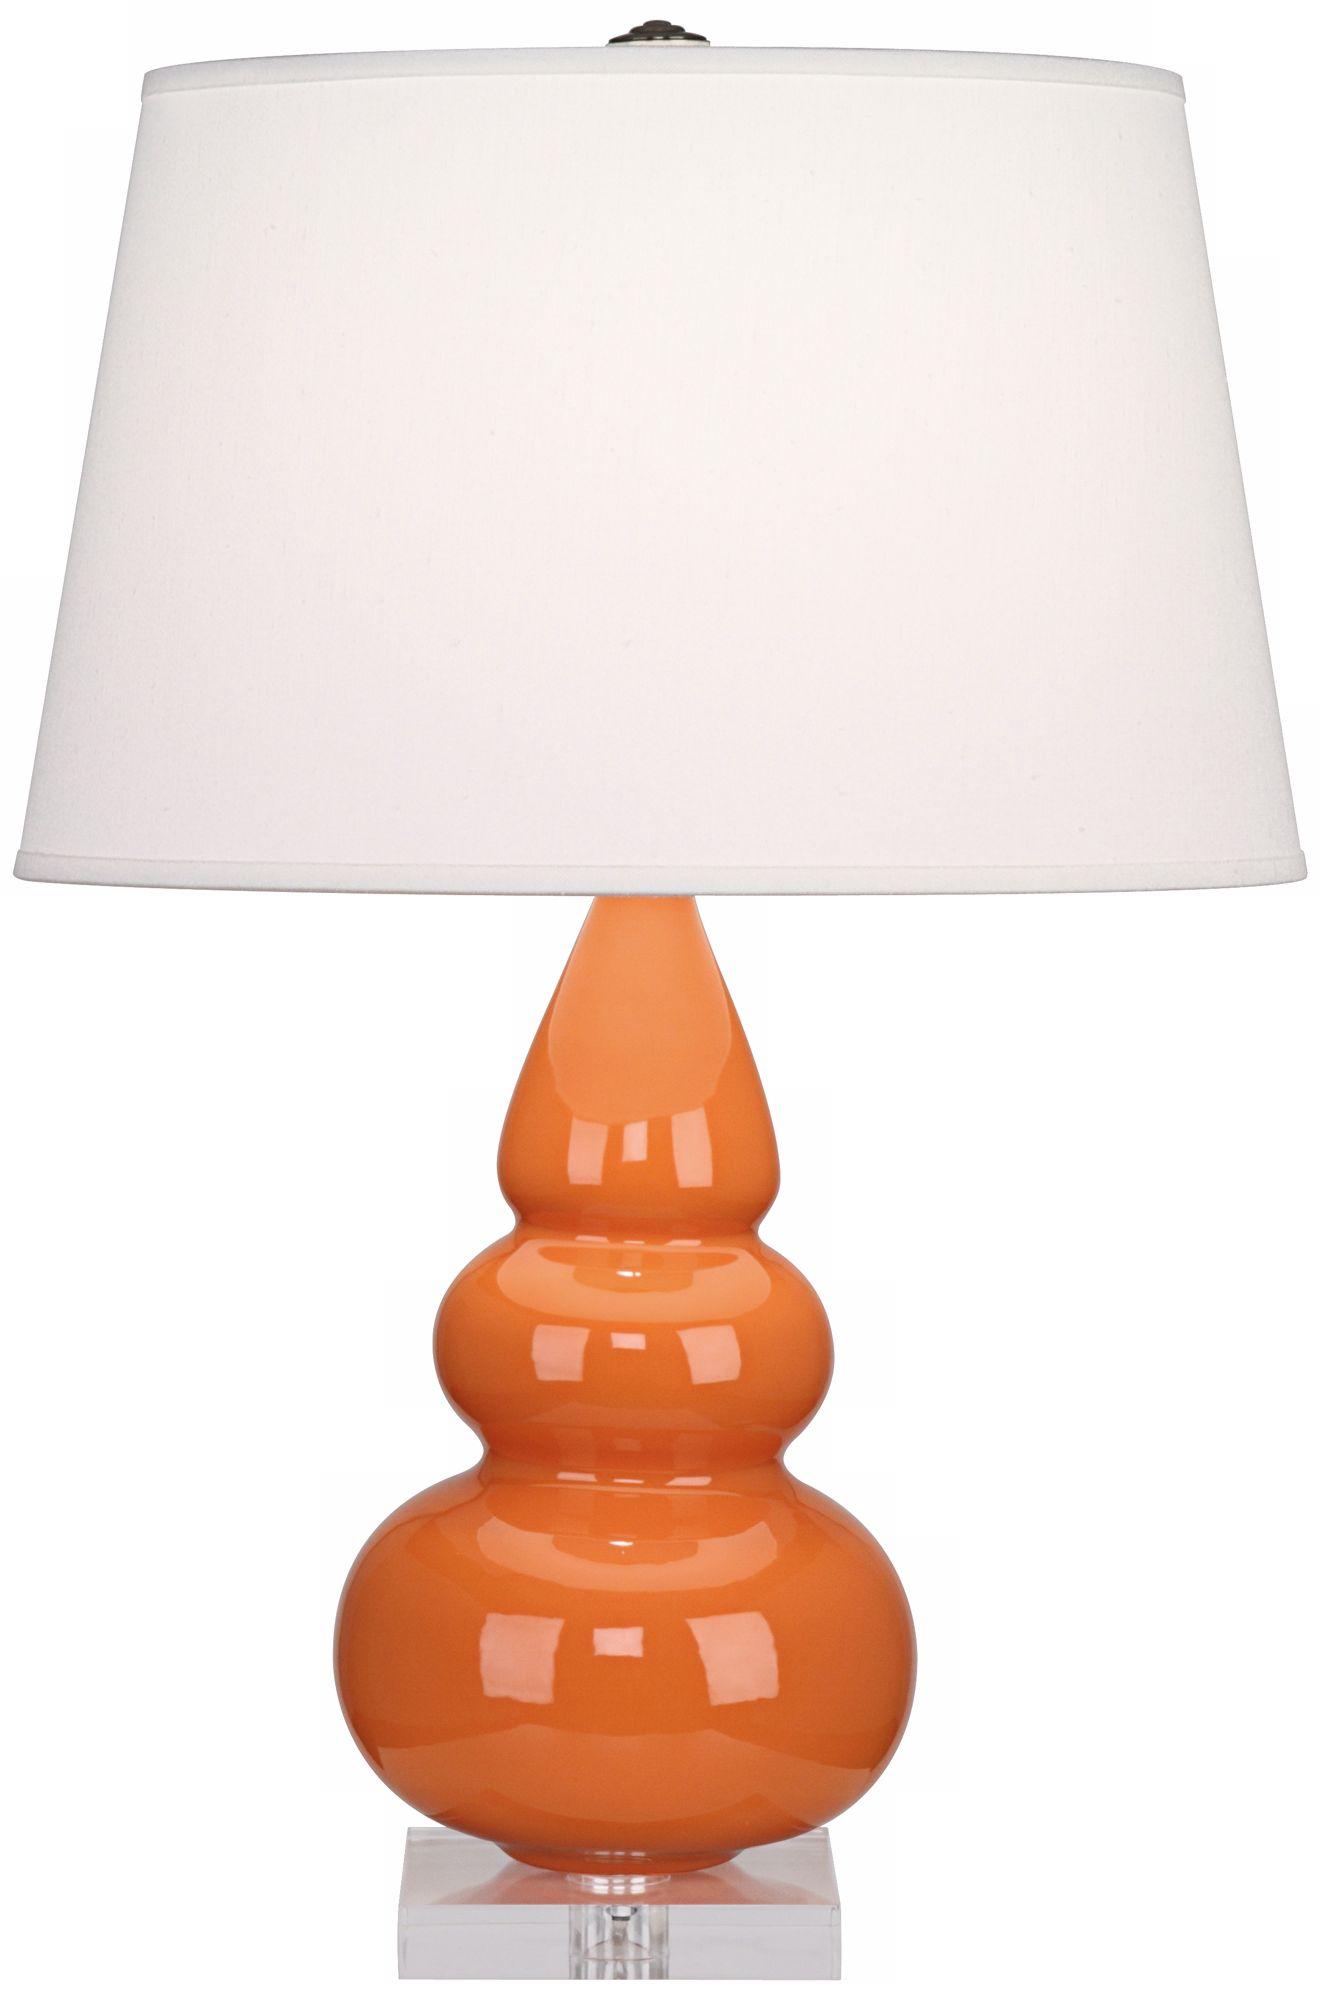 Wonderful Robert Abbey Triple Orange Glazed Ceramic Table Lamp